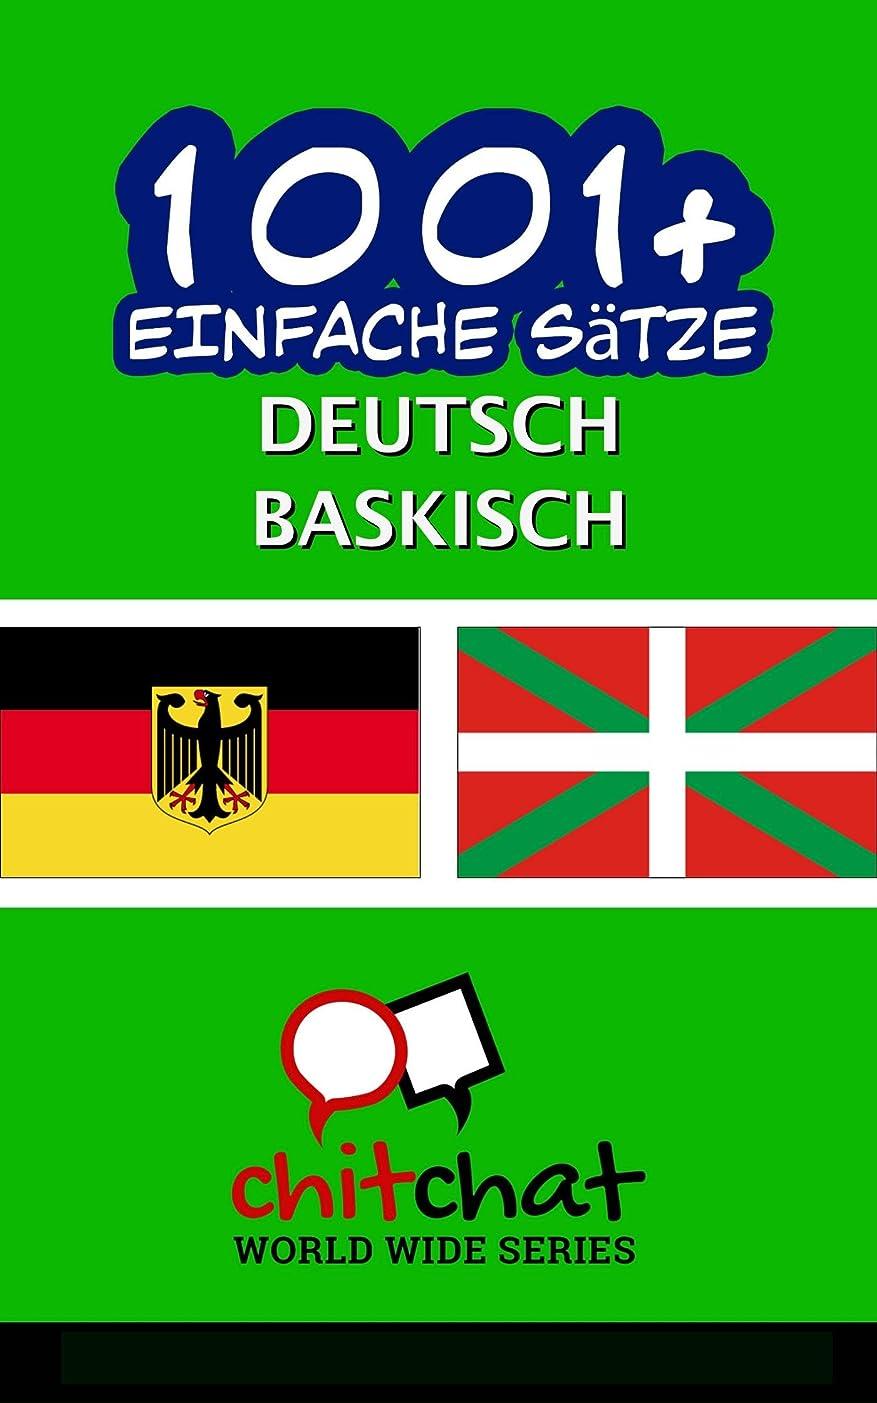 木カウボーイ日光1001+ Einfache S?tze Deutsch - Baskisch (German Edition)